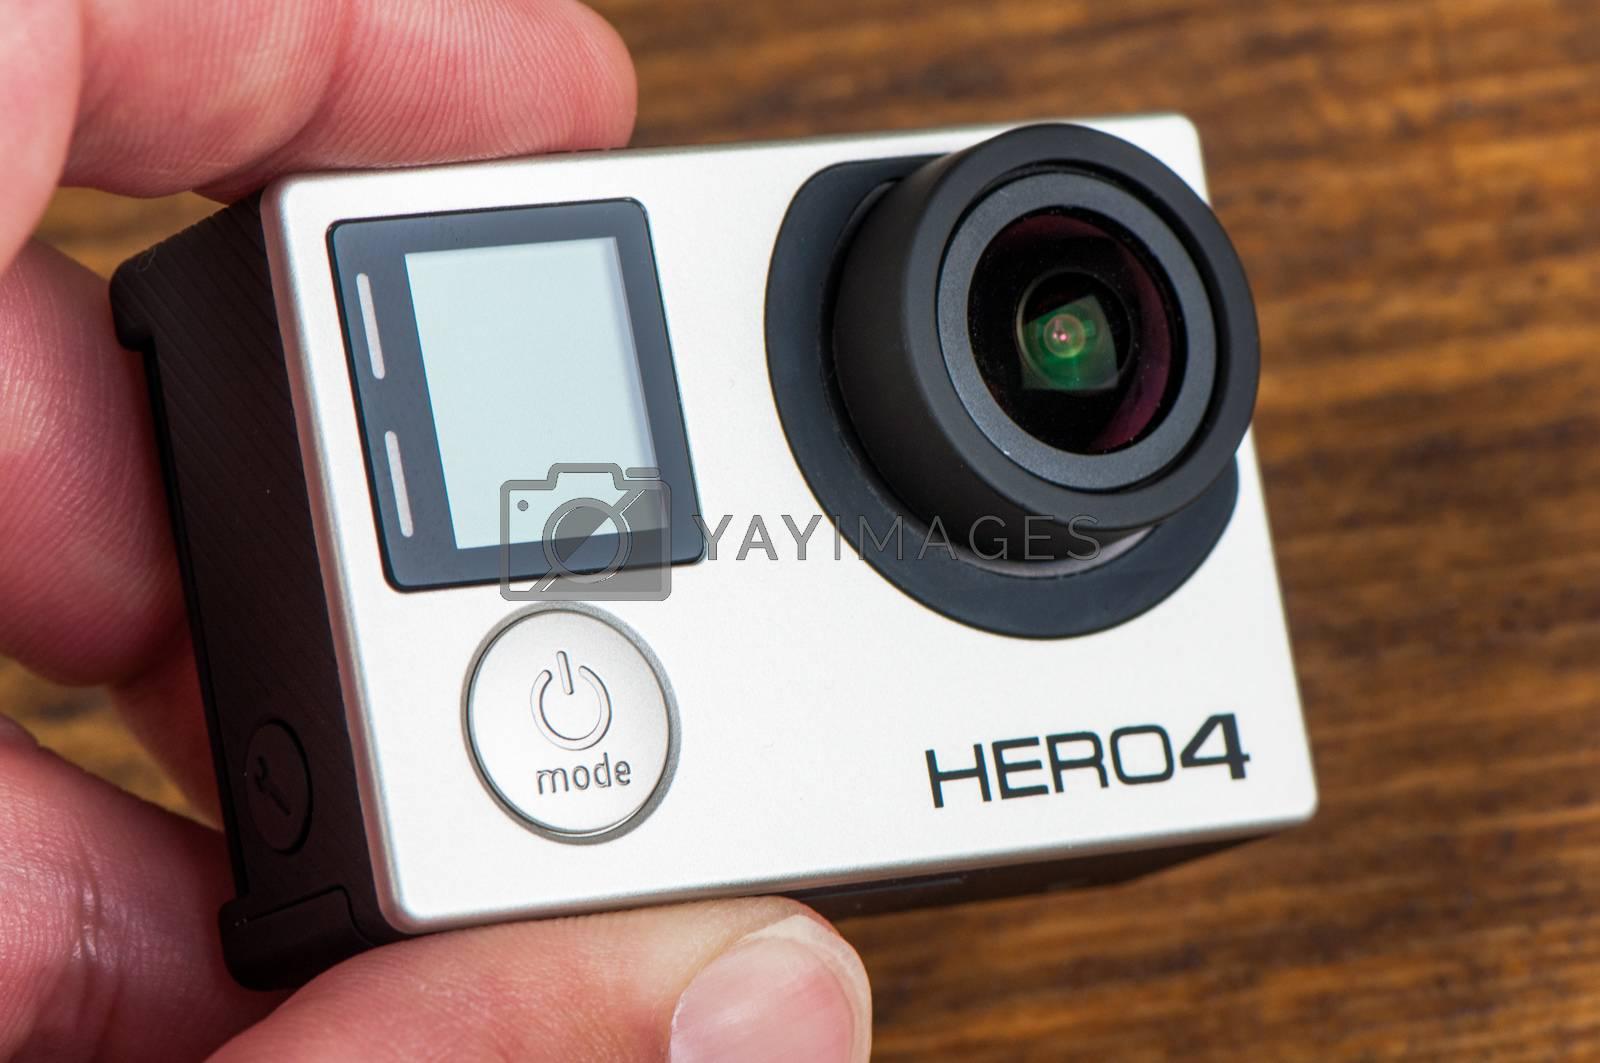 NOVI SAD, SERBIA - JUNE 19, 2016: GoPro Hero 4 Black waterproof action camera announced in september 2014 captures slow motion at up to 240 frames per second, illustrative editorial